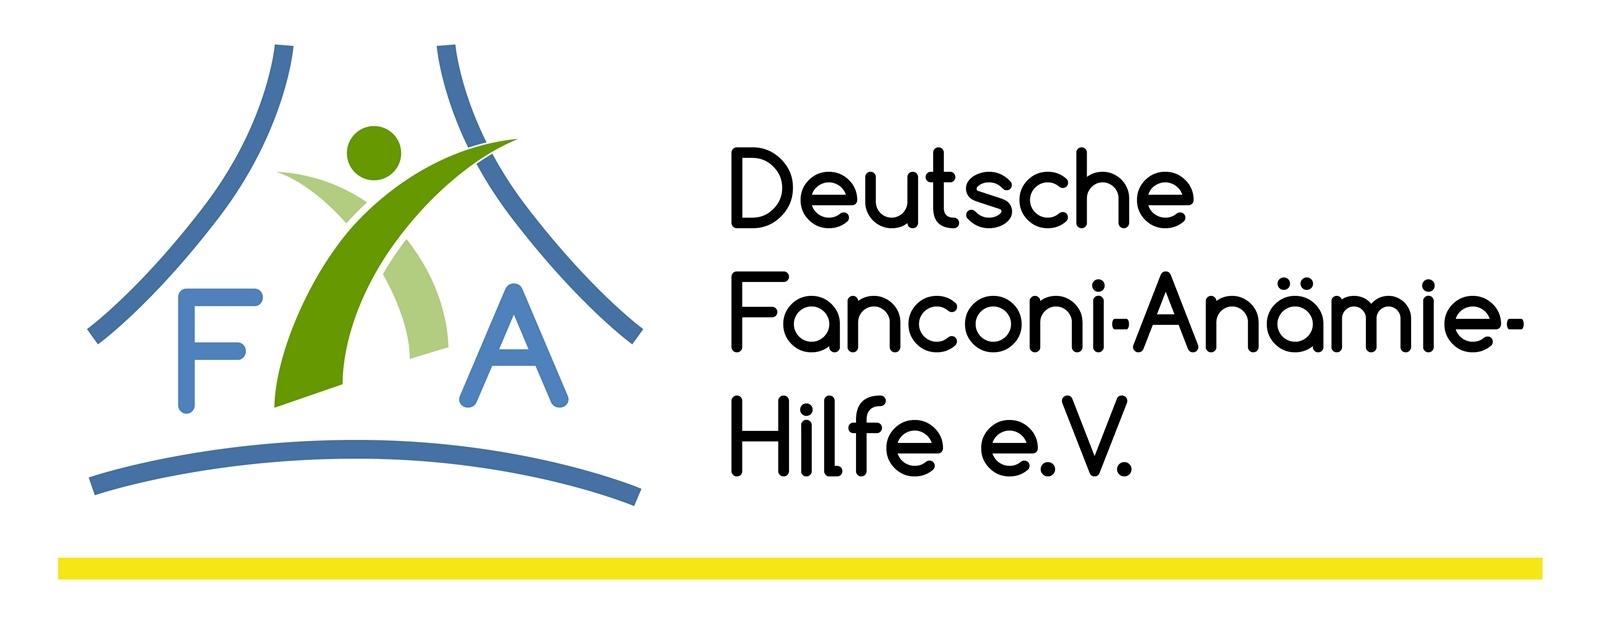 Logo der Deutschen Fanconi-Anämie-Hilfe e. V.